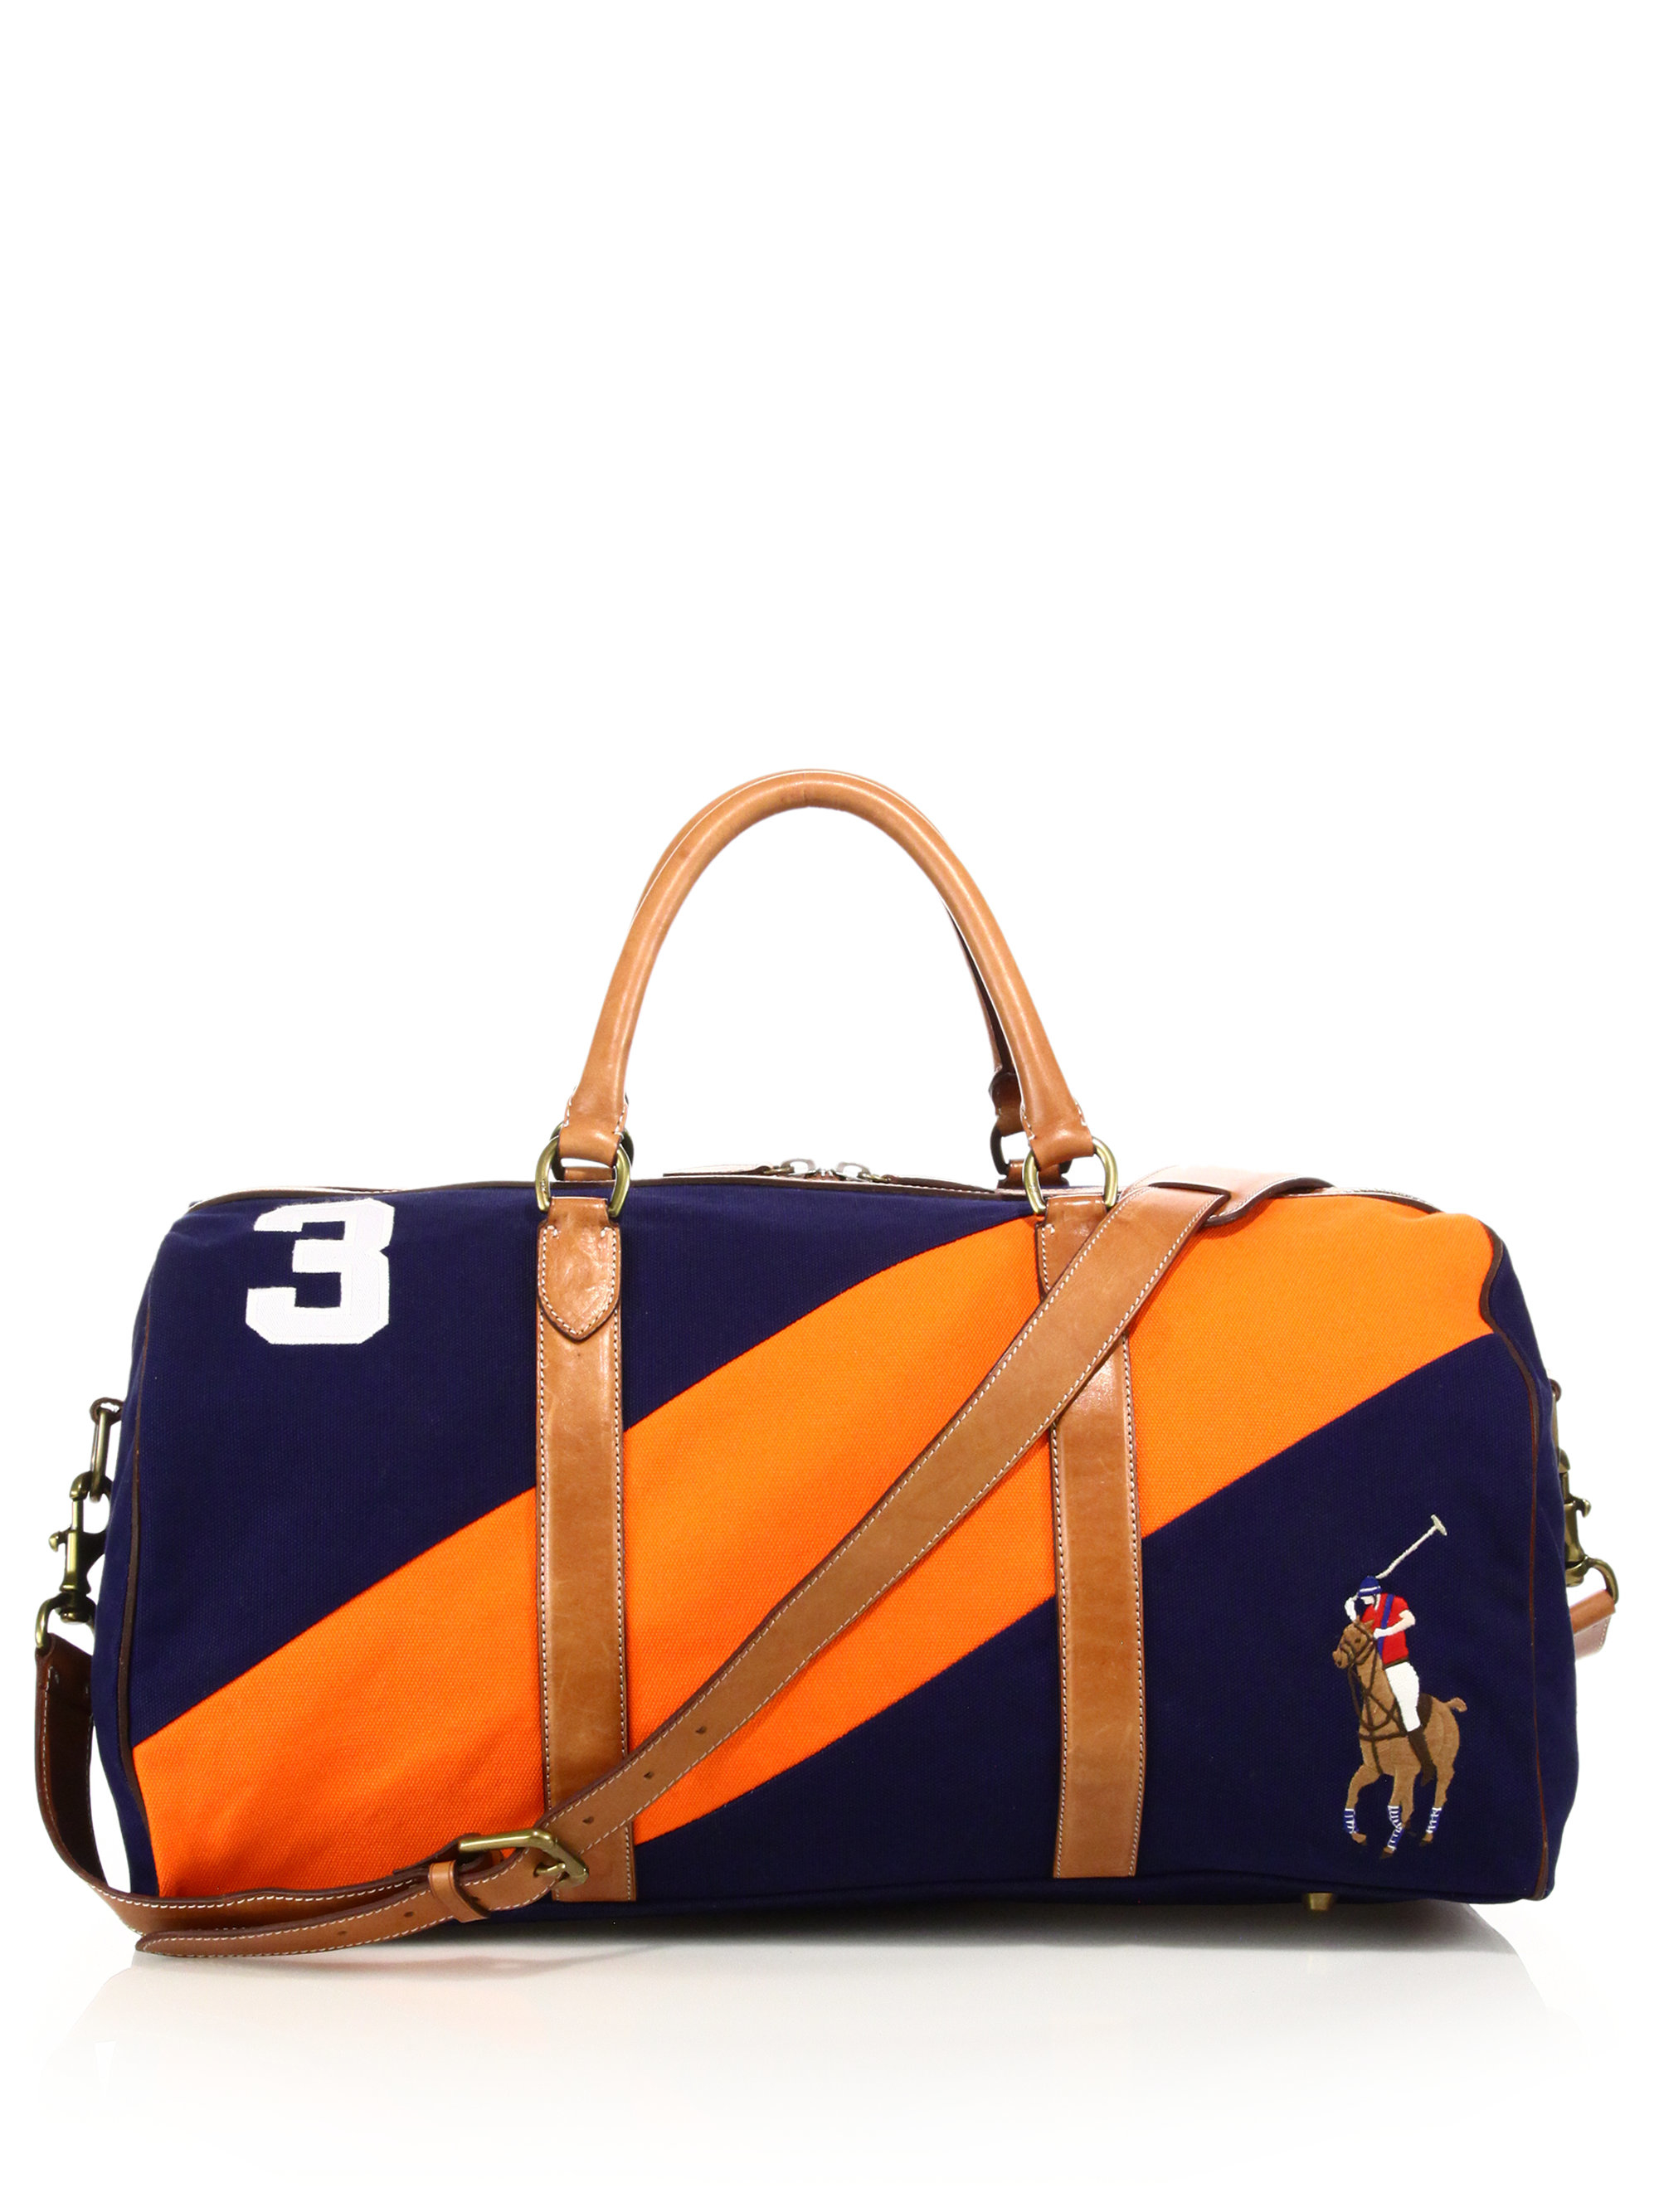 f22c5f150f 2018 fbb01 0f94e  closeout ralph lauren polo green blue duffle weekend bag  fed91 2259d